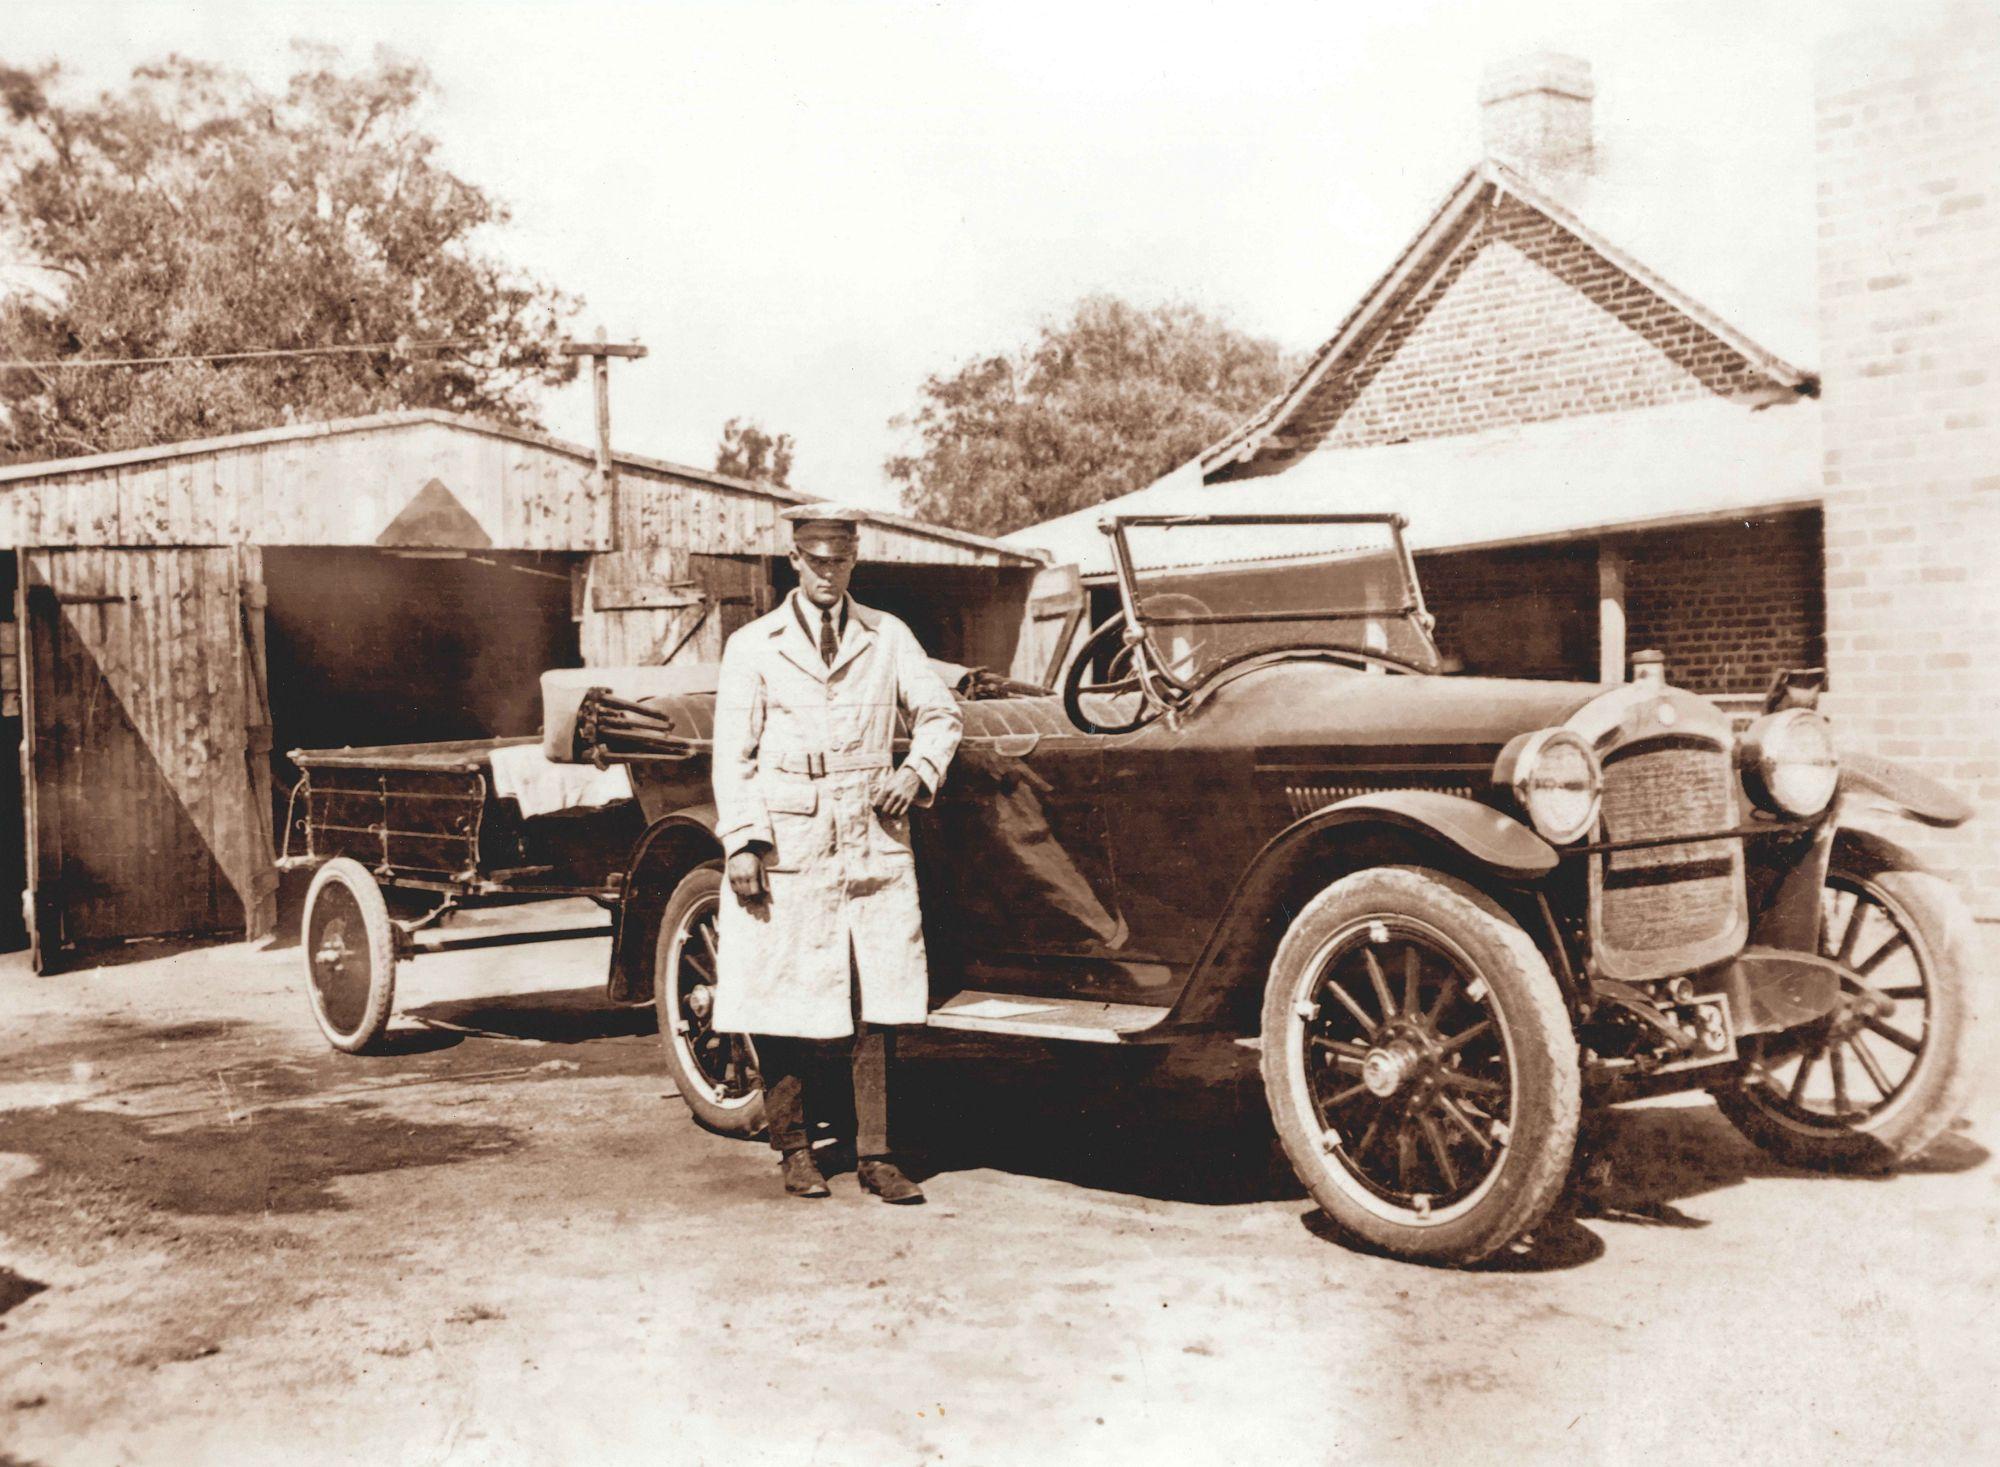 Bignell's Hupmobile Busselton, driver unknown